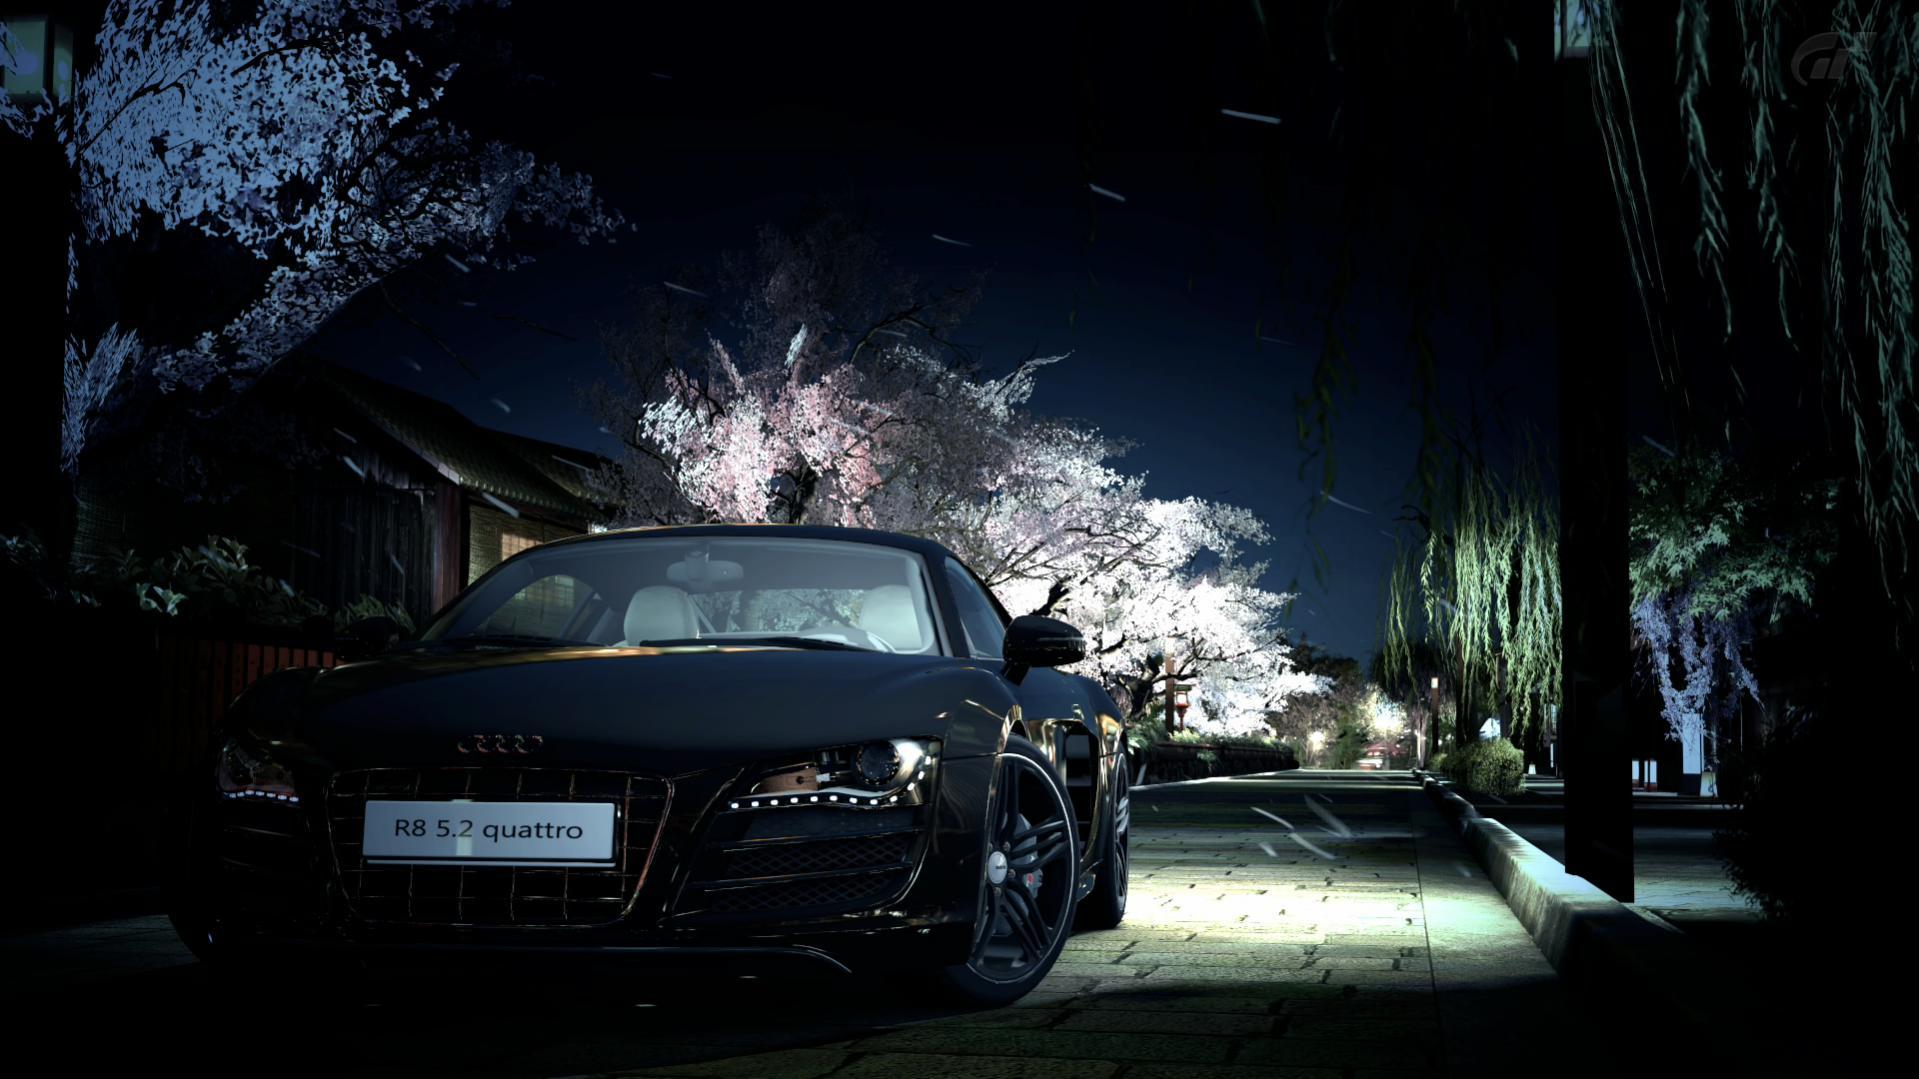 54591d1293591589-gran-turismo-5-kyoto-gion_1-2- Fascinating Gran Turismo Psp Bugatti Veyron Price Cars Trend